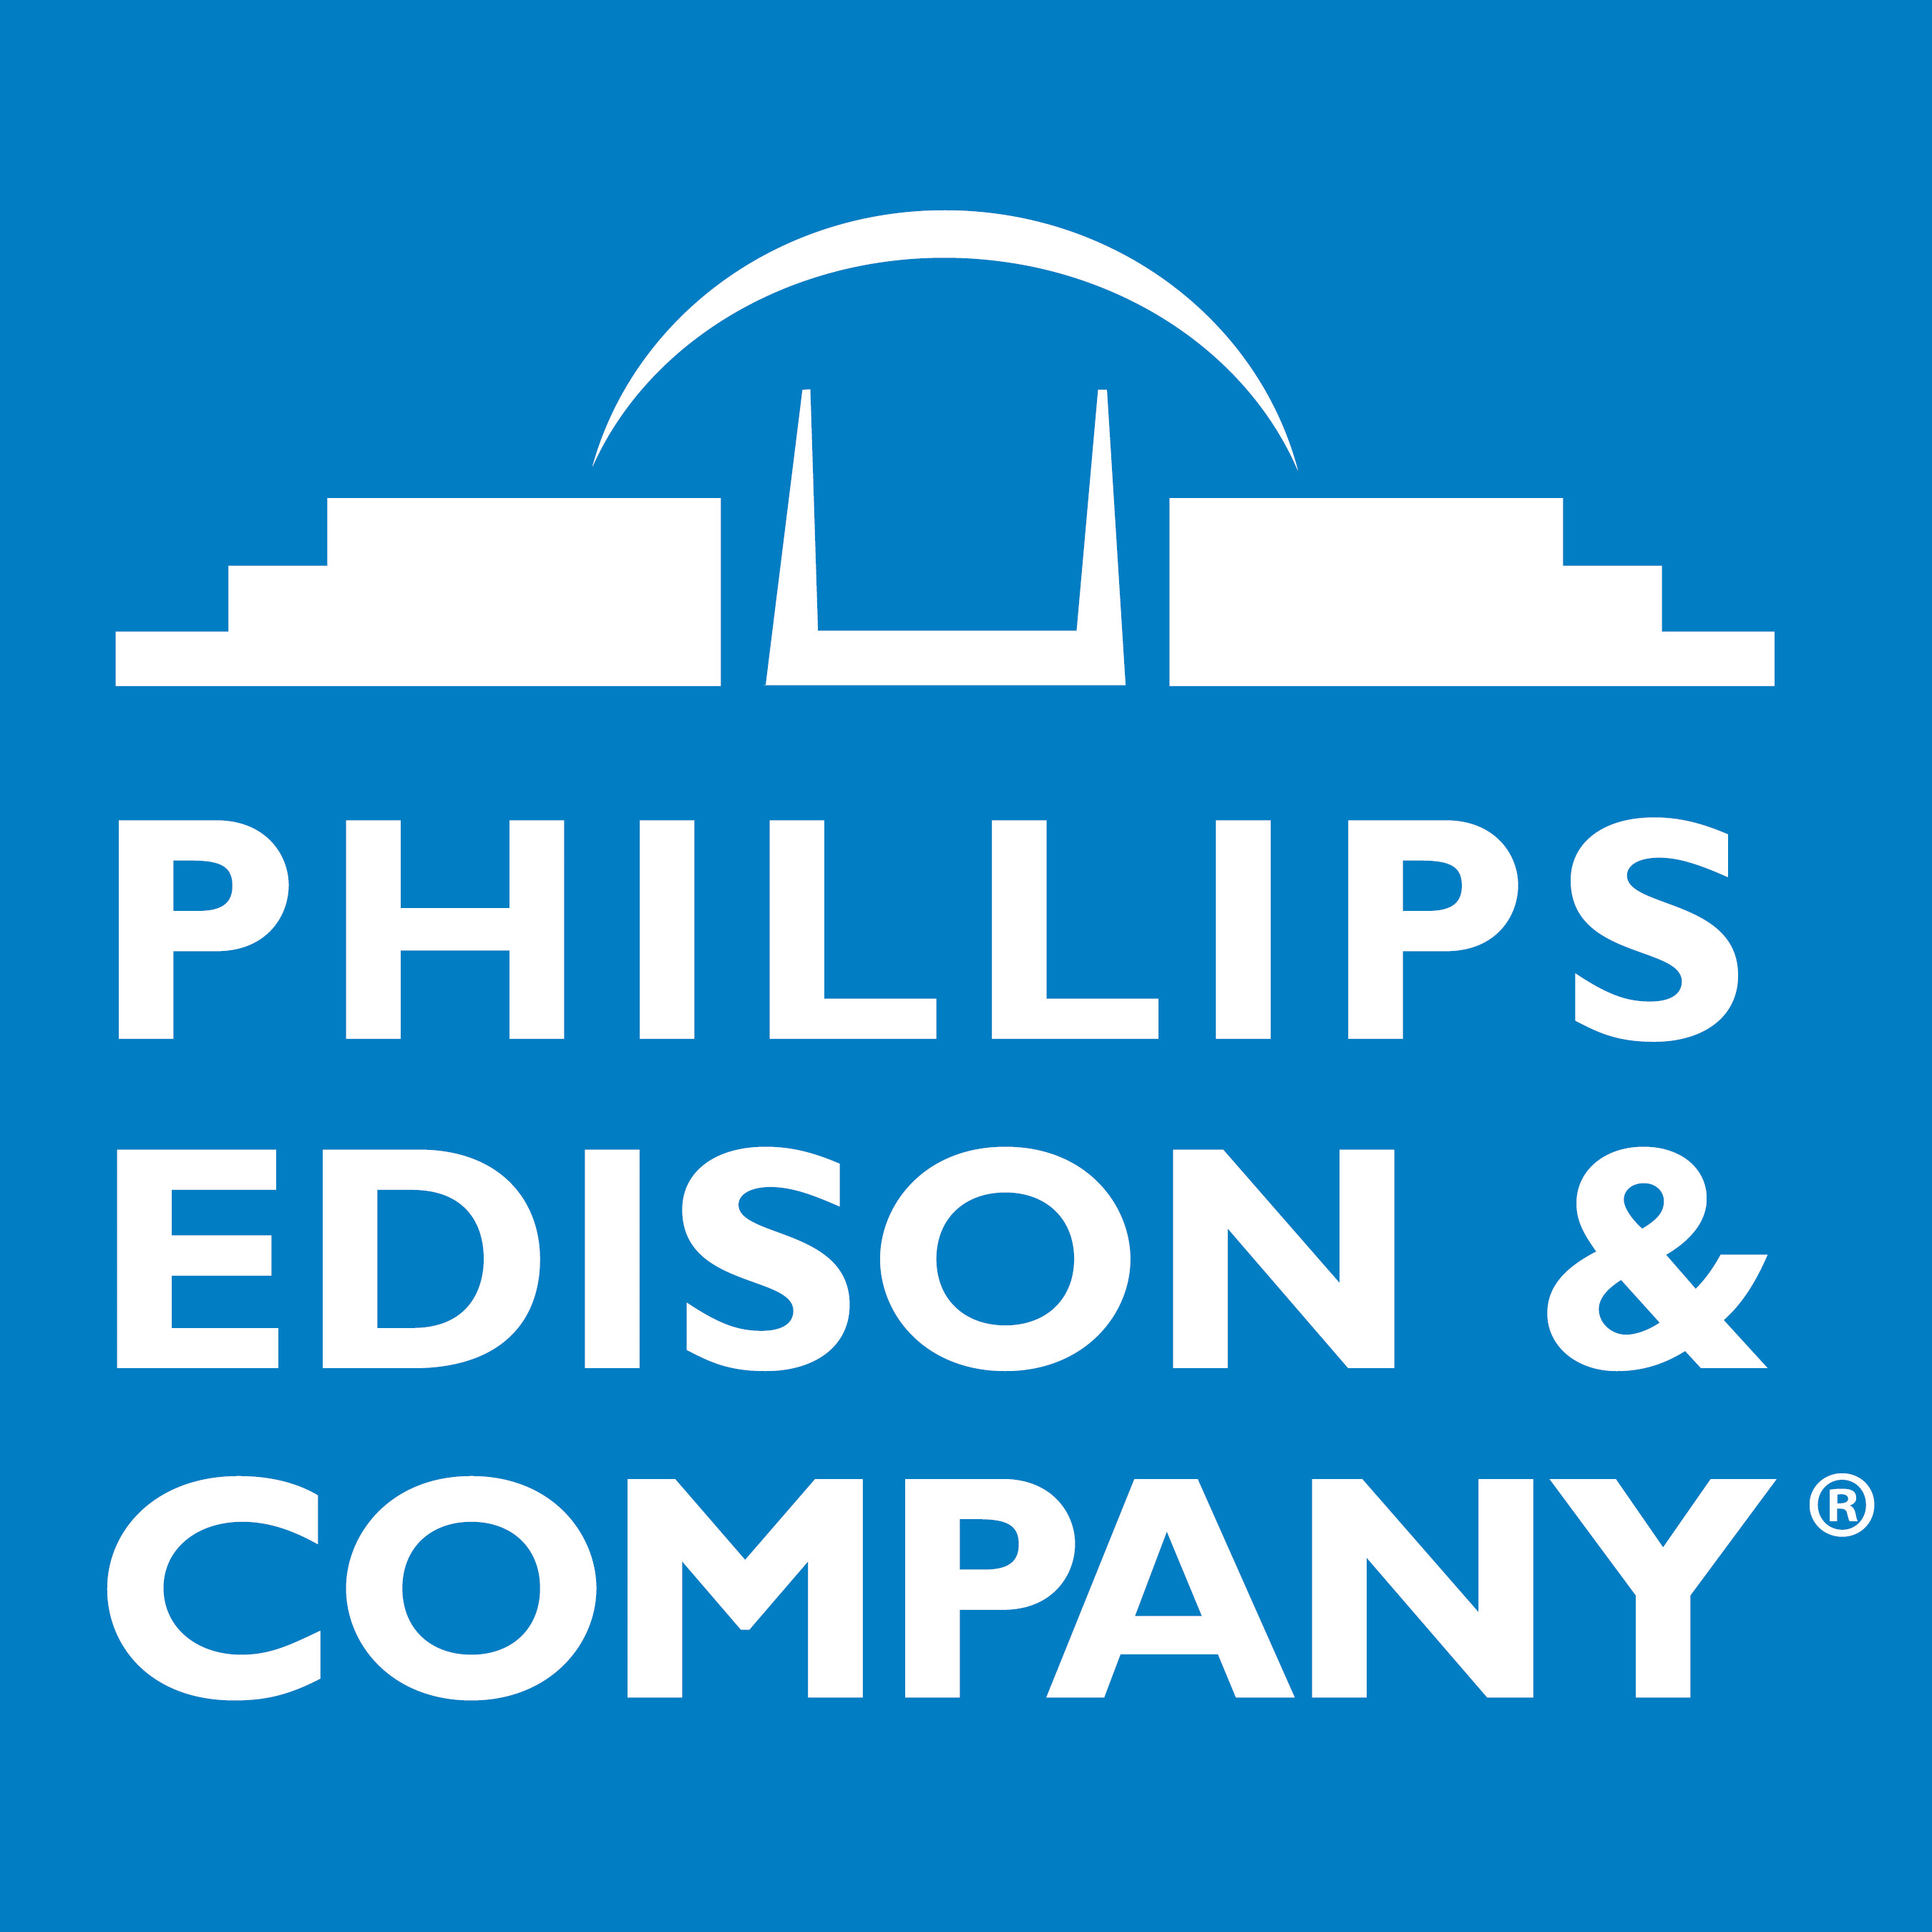 Phillips Edison & Company logo